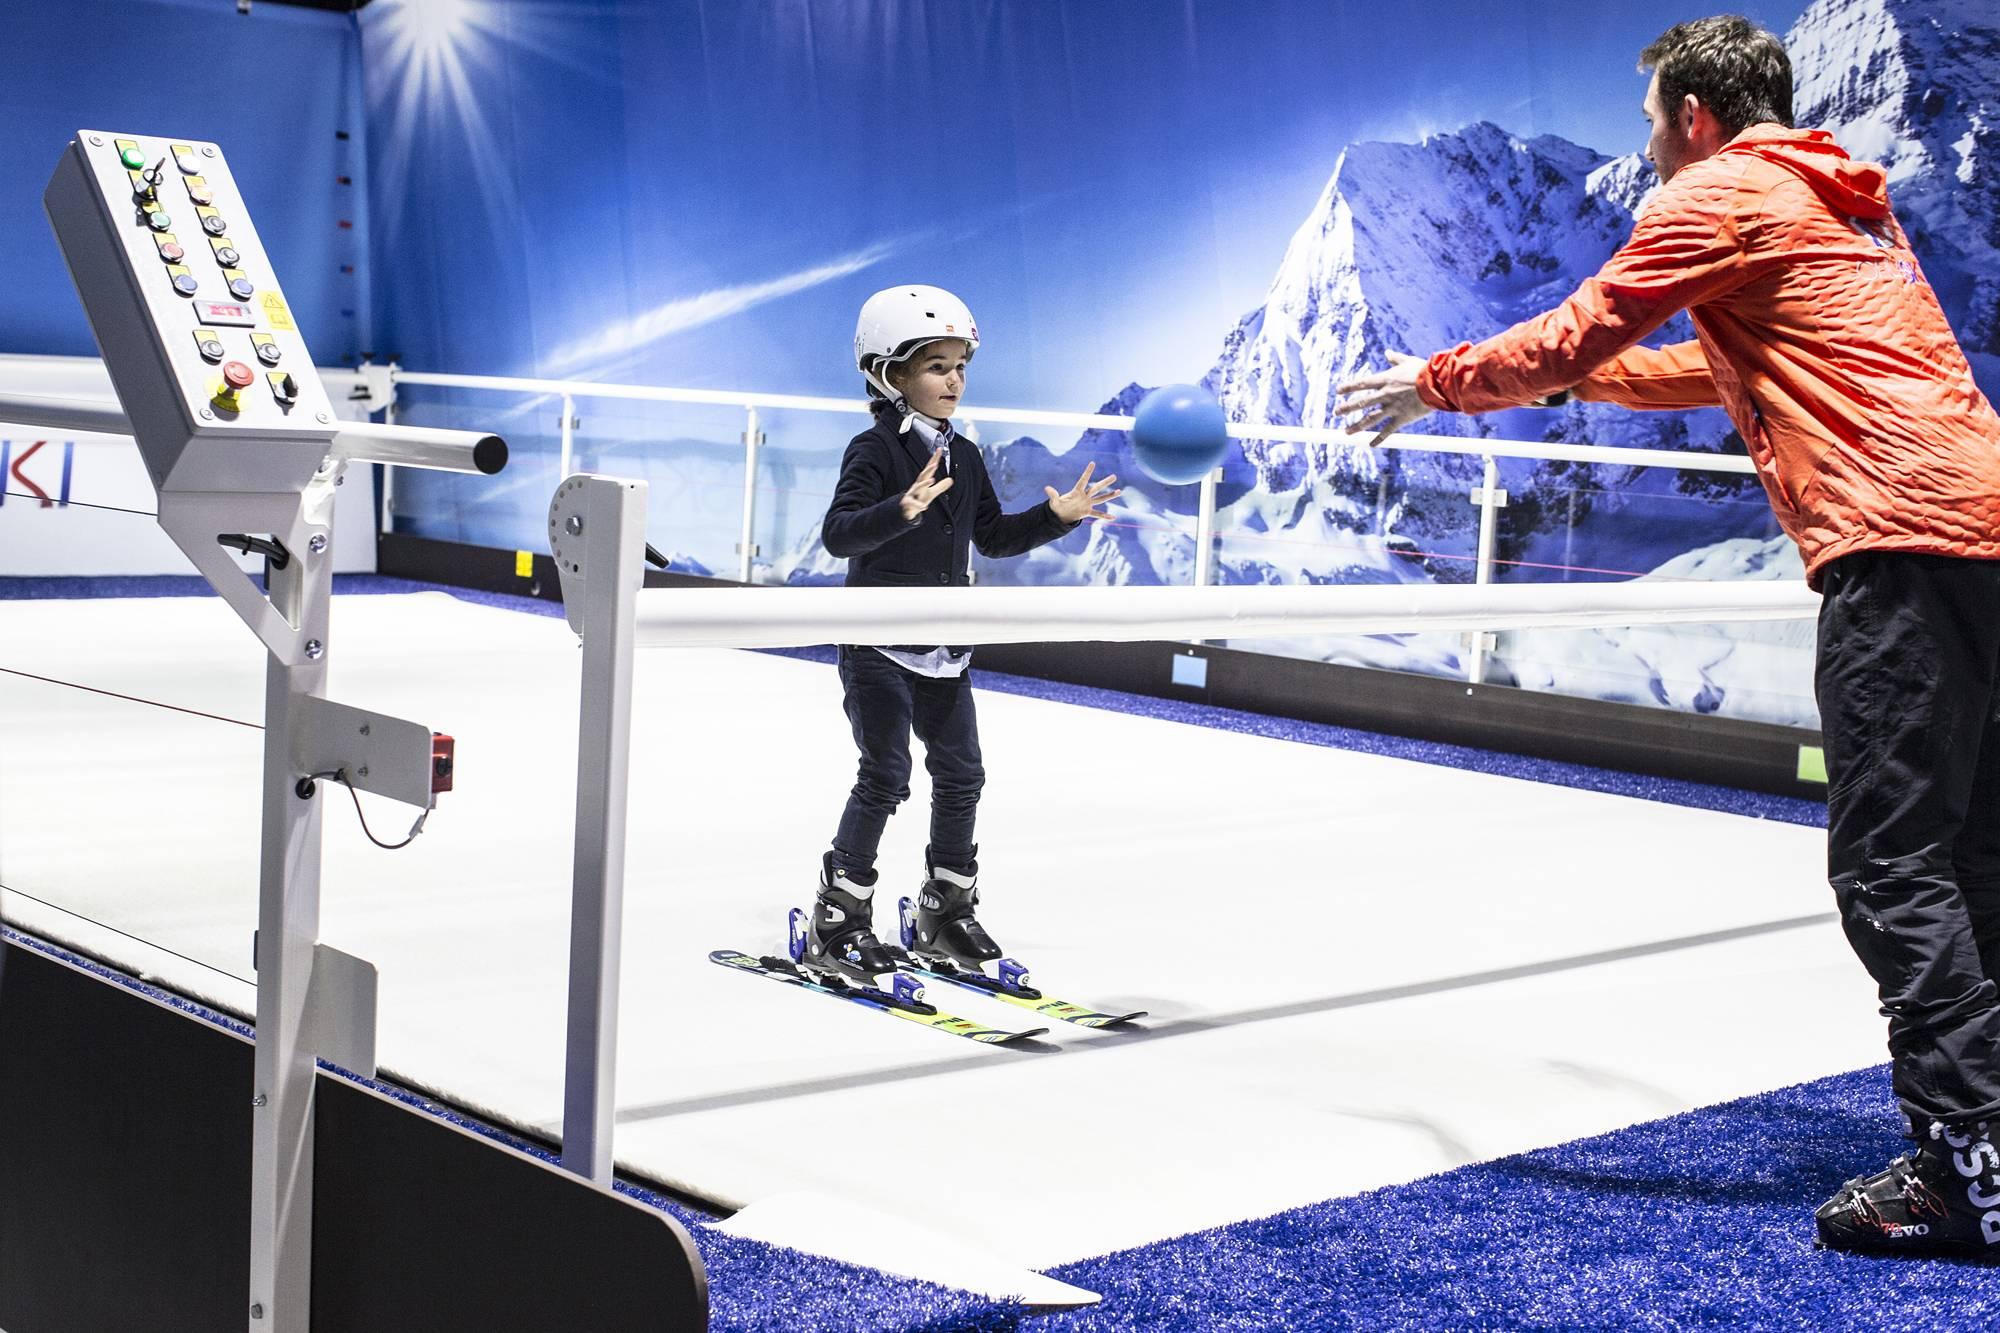 cours de ski enfants lyon